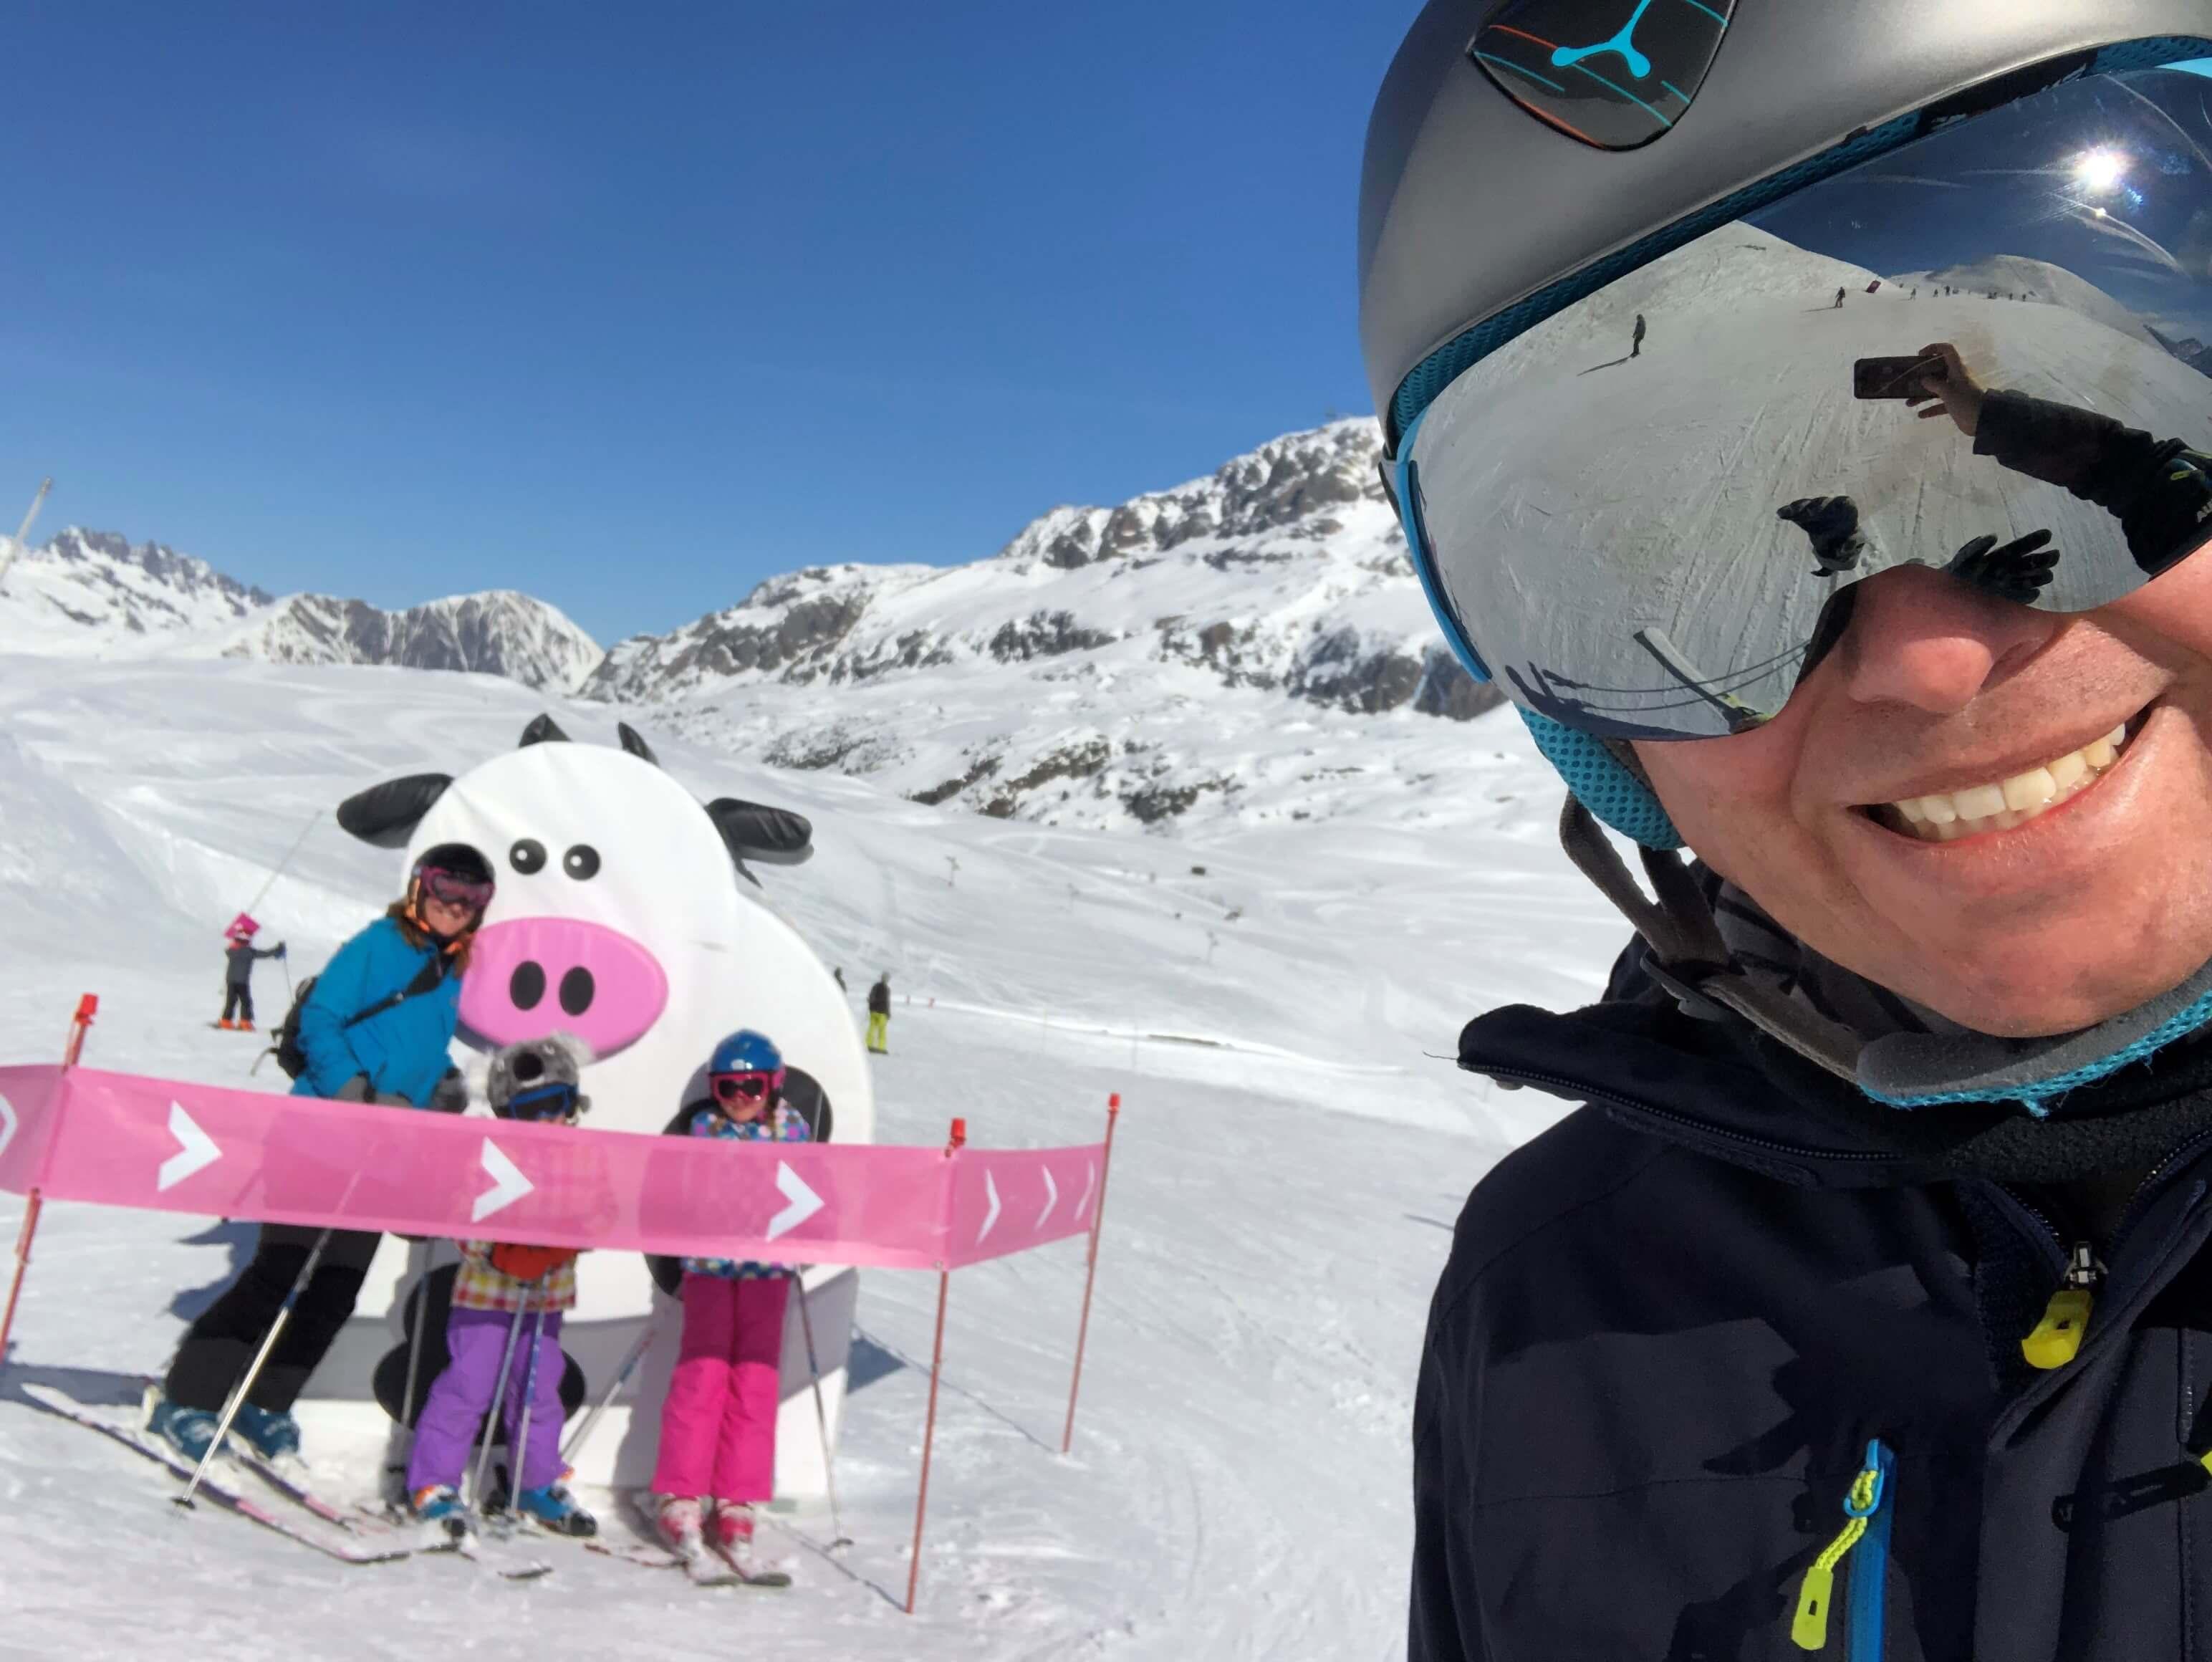 Newmarket Holidays CEO Niel Alobaidi on a family ski trip to the Alps.